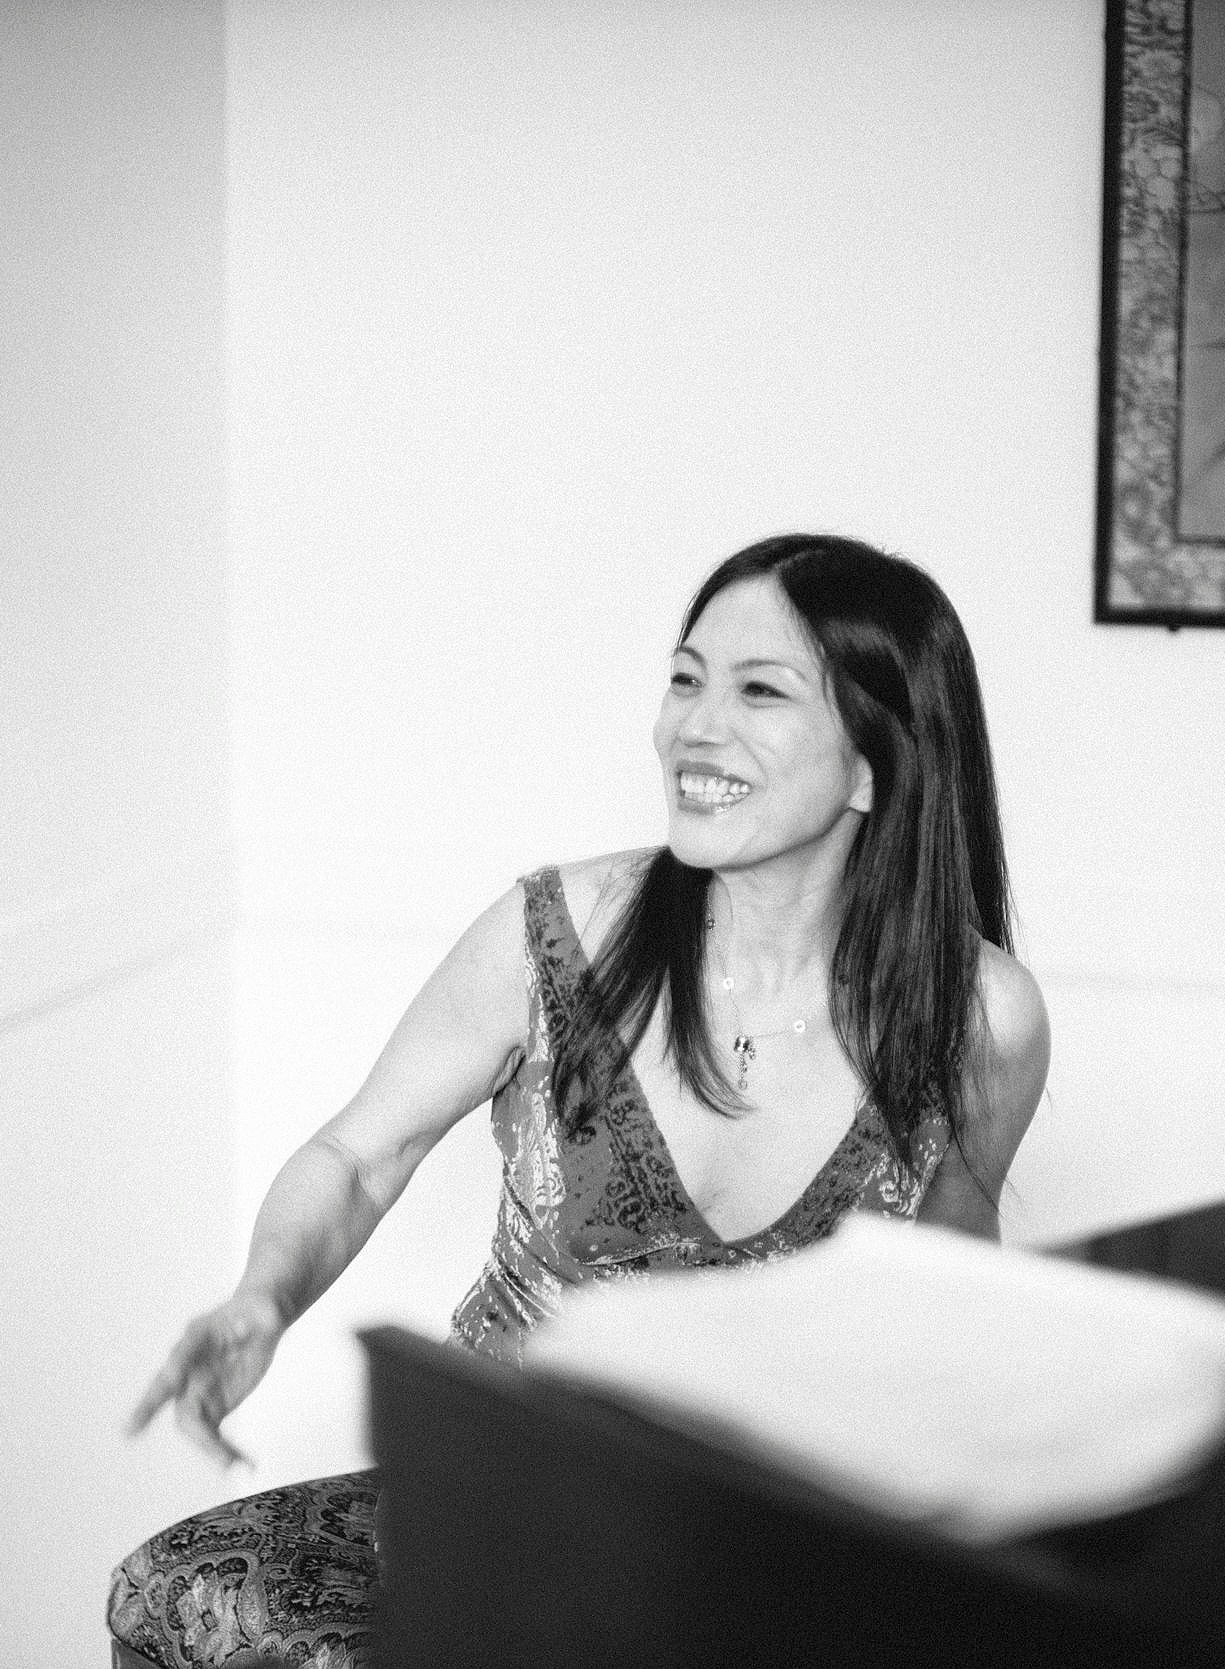 GERSHWIN Rhapsody in Blue, Second Rhapsody - Cecile Licad, piano(with Jun Cho)